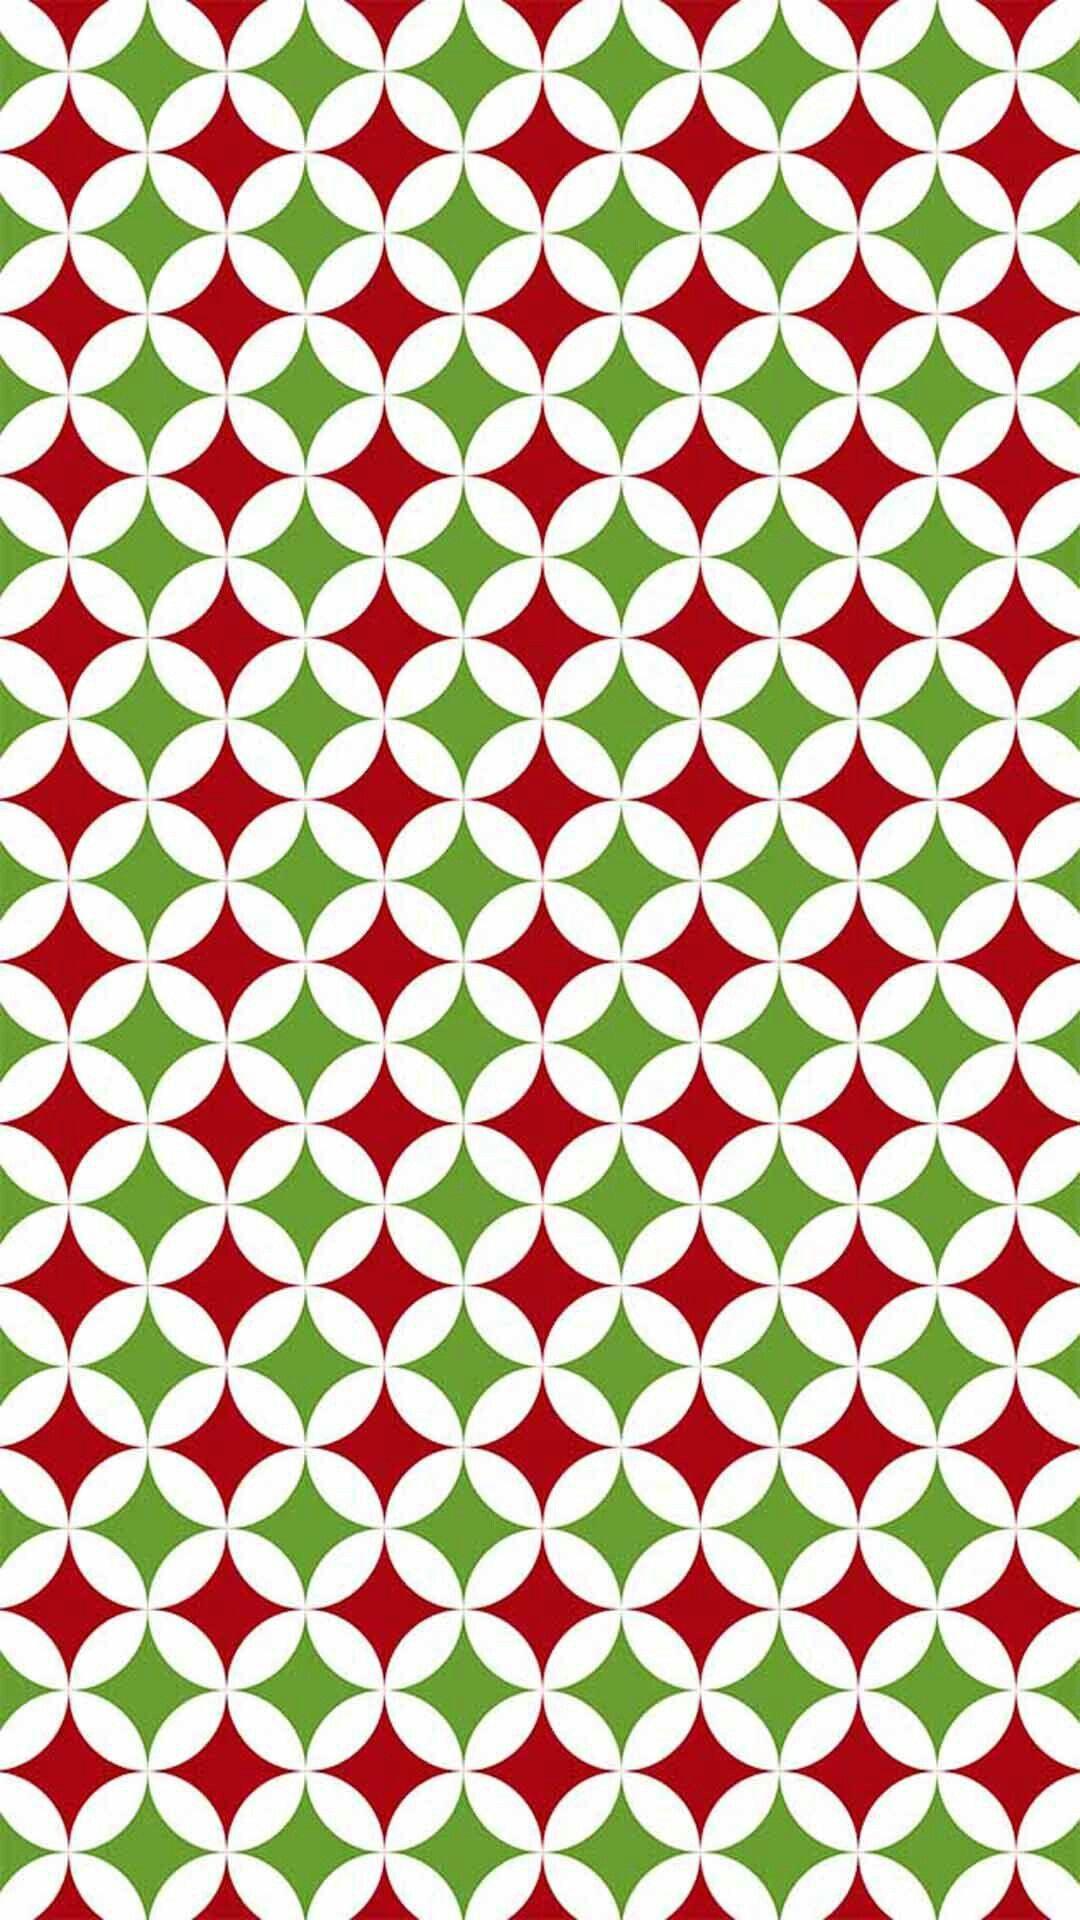 Iphone Wall Christmas Tjn Christmas Paper Pinterest Image